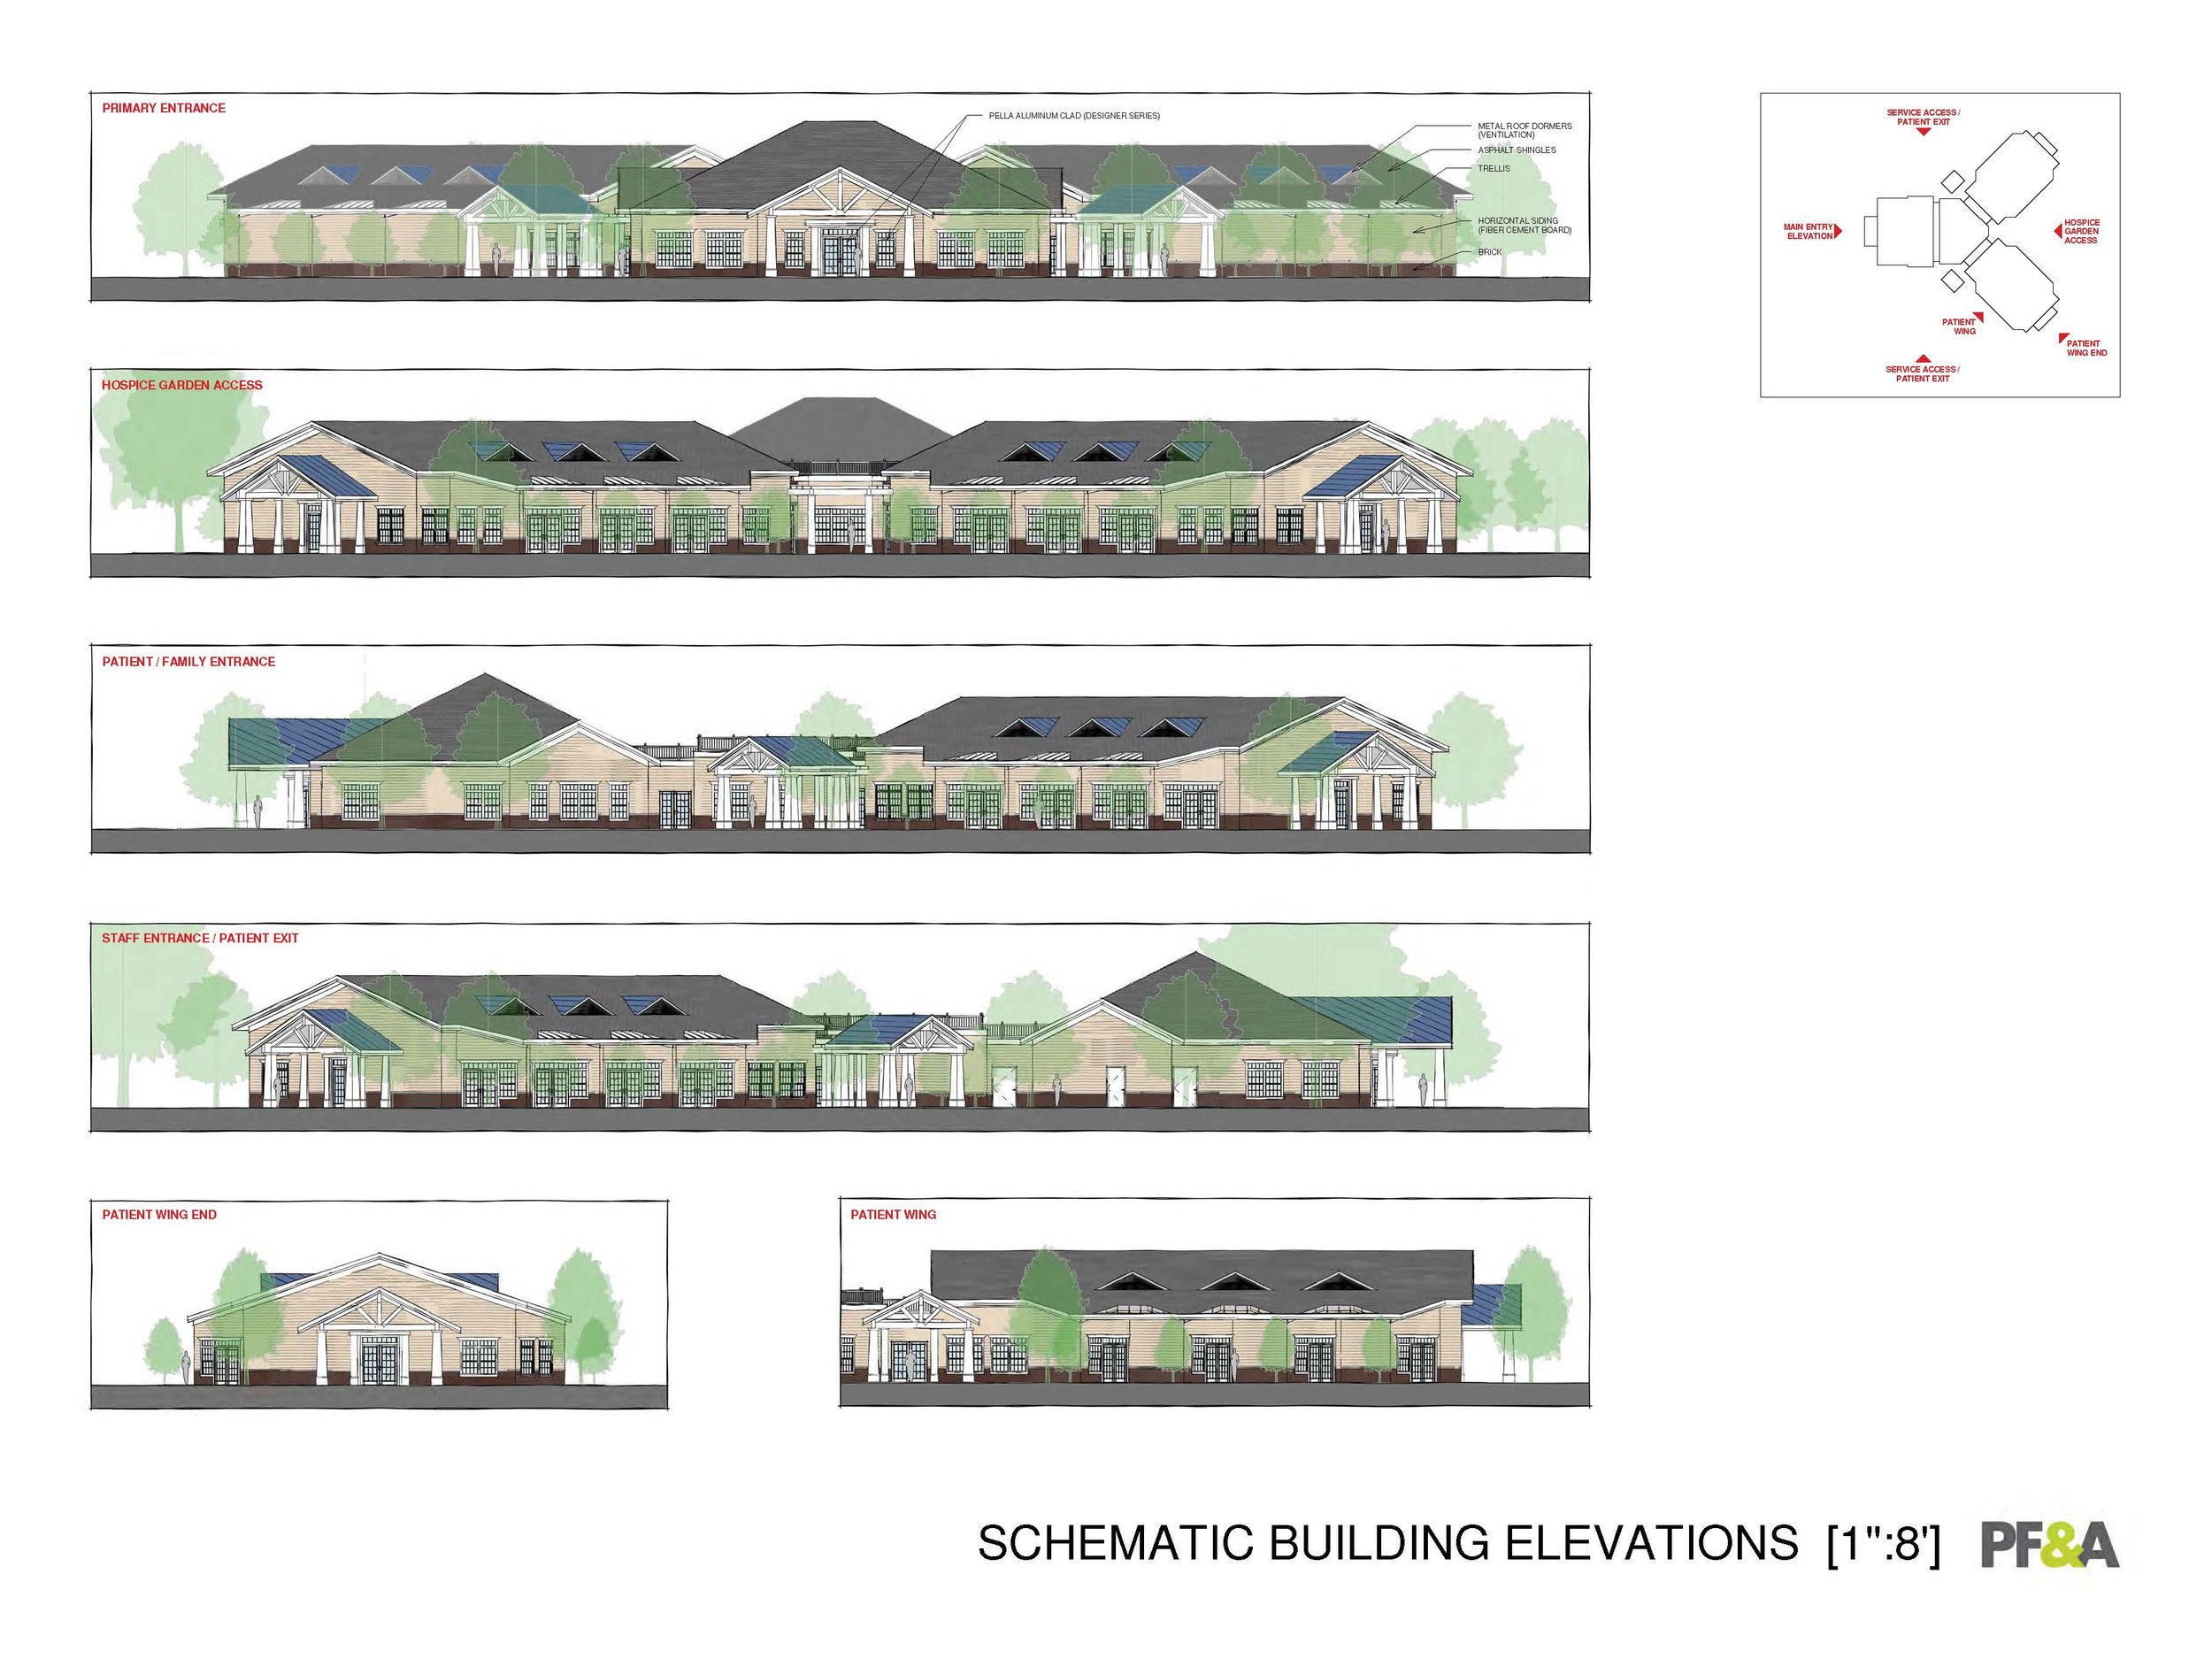 04_Schematic Building Elevations.jpg